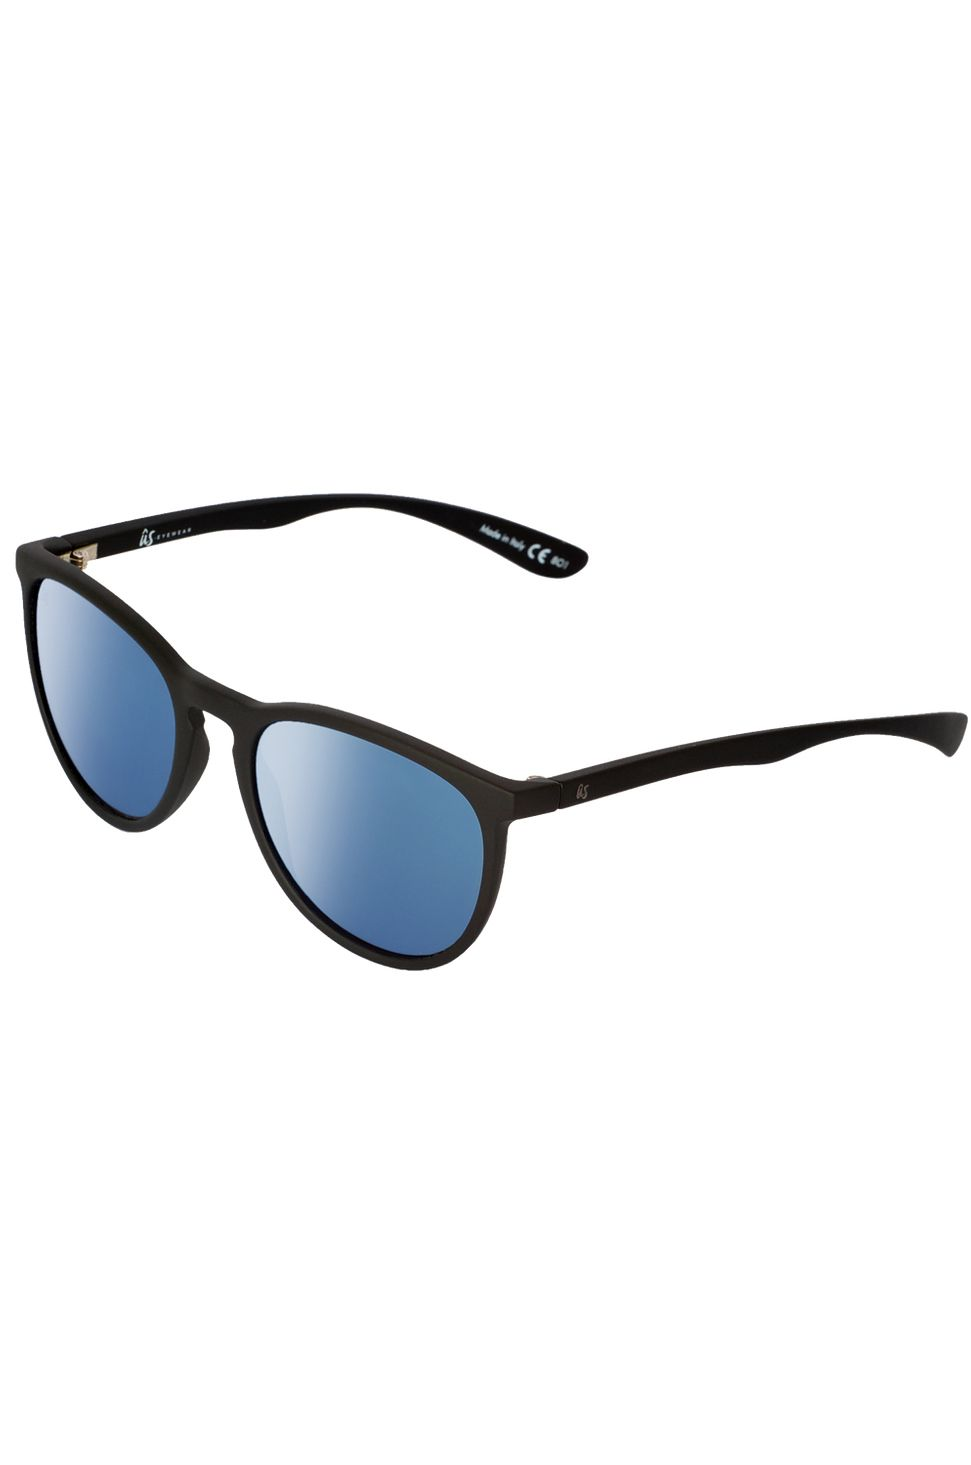 US Sunglasses NOBIS Matte Black/Grey Blue Chrome